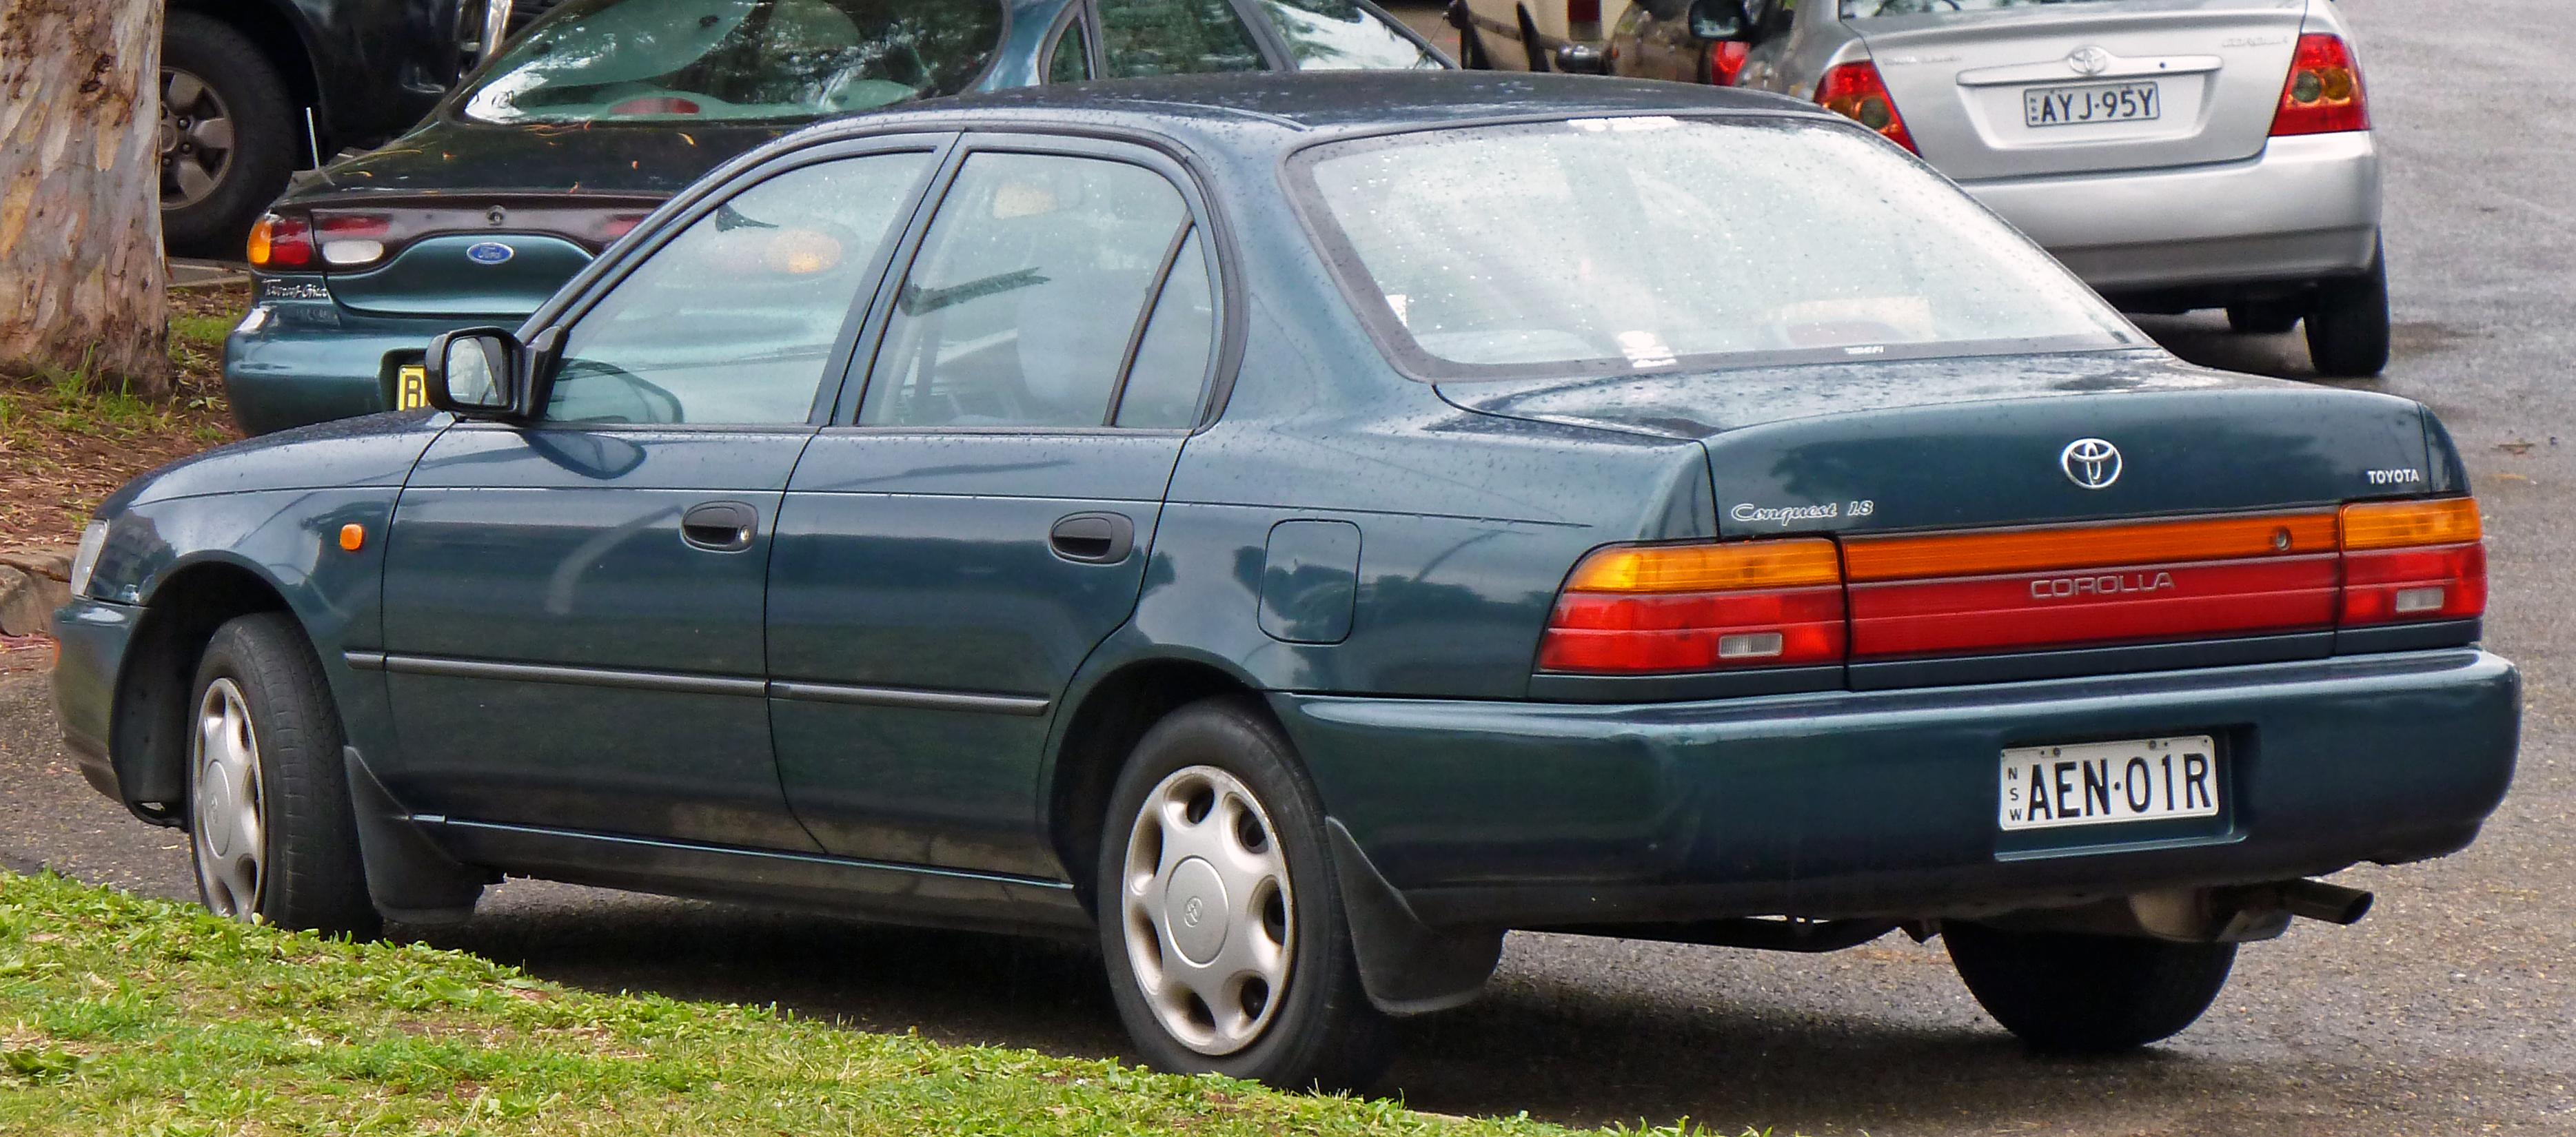 1999 toyota corolla 3 toyota corolla 3